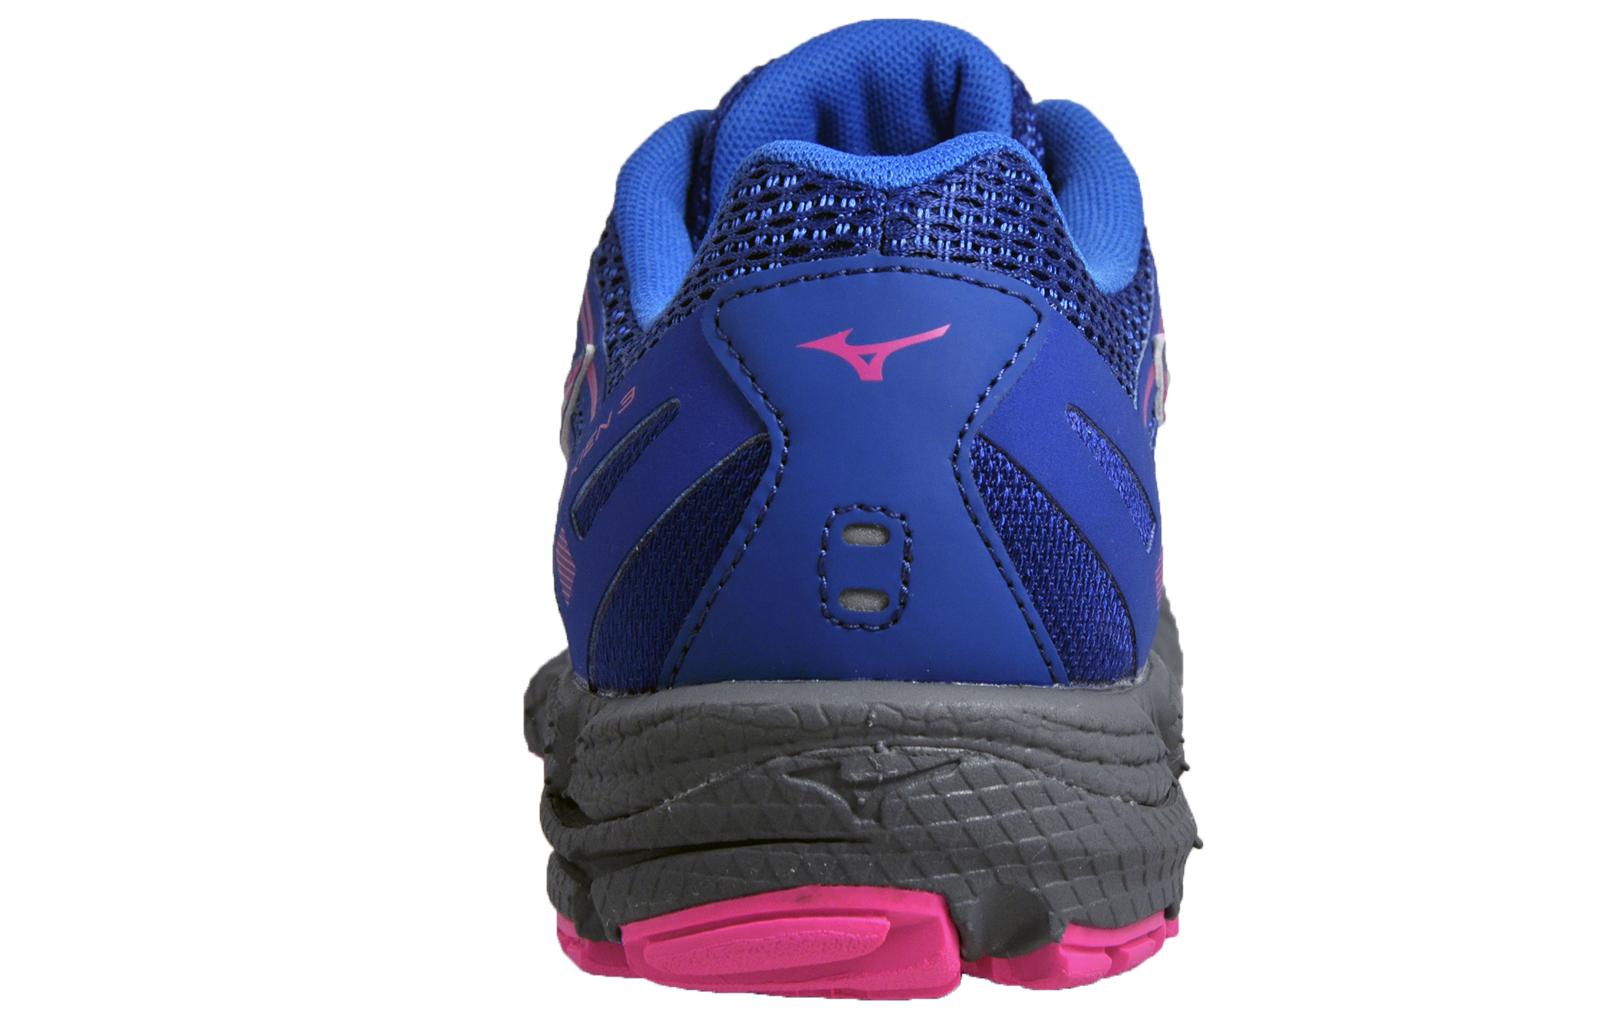 Mizuno Wave Kien 3 Womens All Terrain Trail Running Shoes Trainers Blue c1f56a97df3